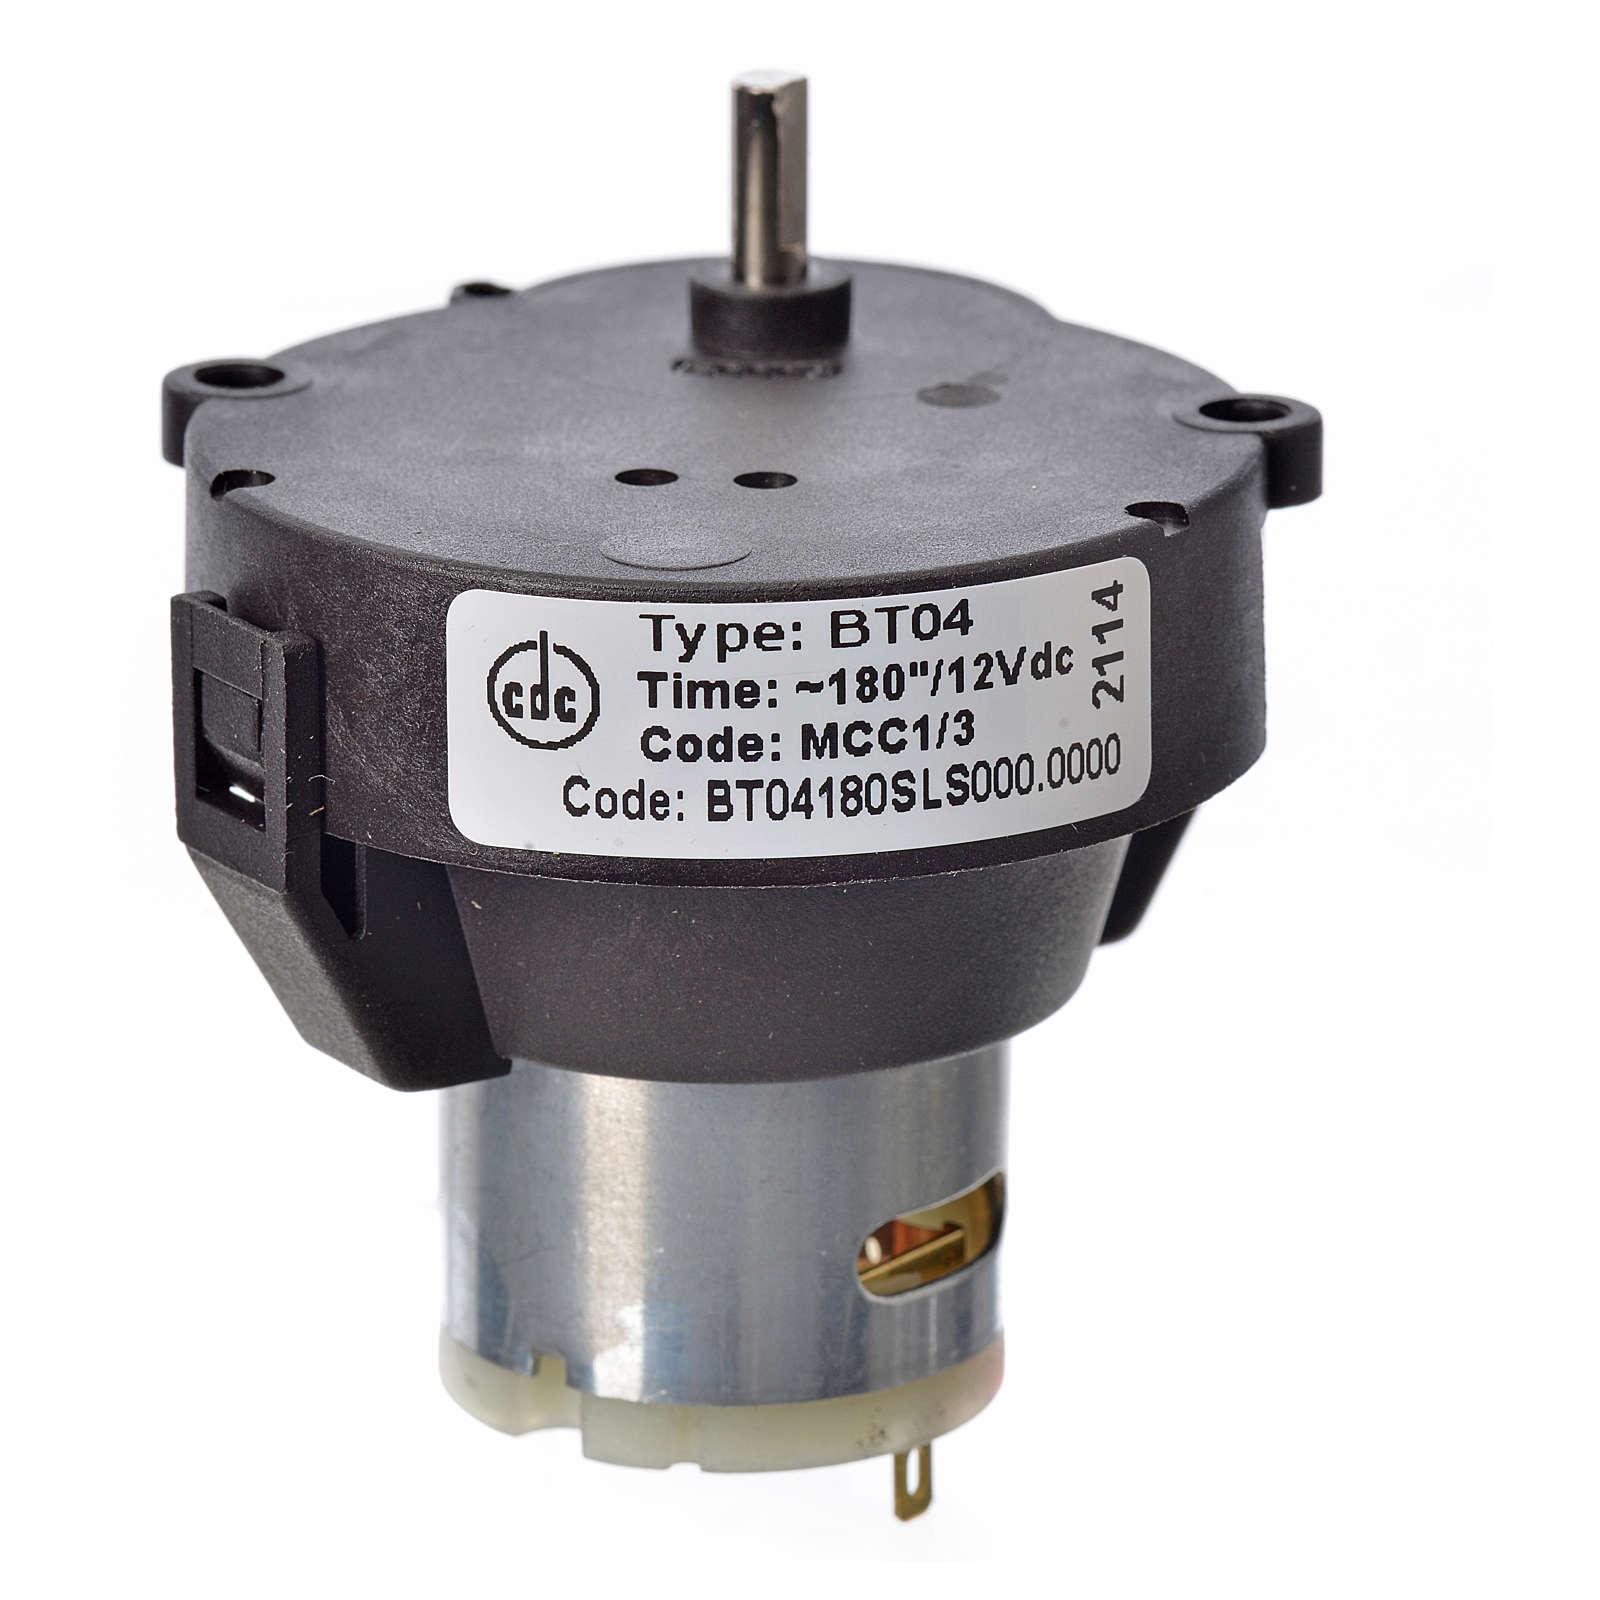 Motorreductor belén MCC corriente continua 12V rpm 1/3 4